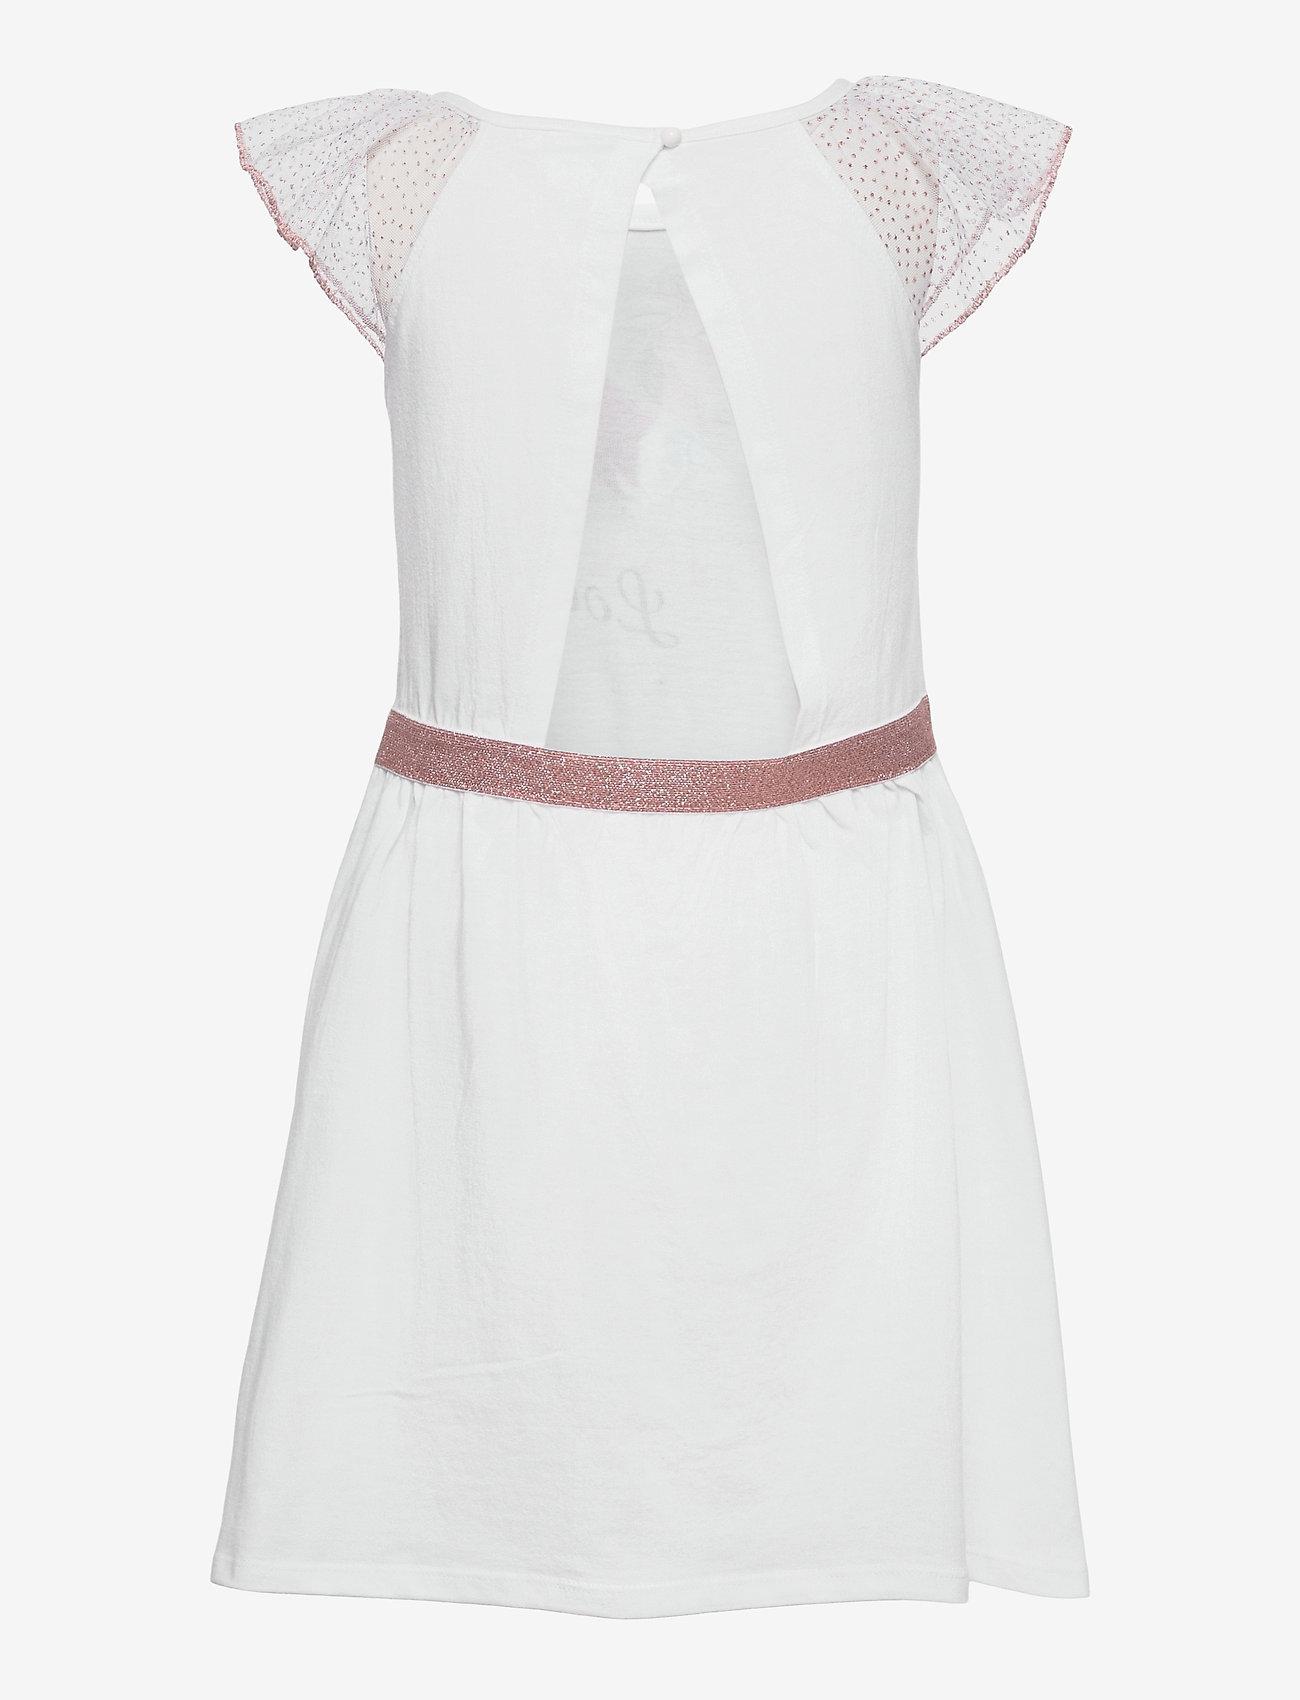 Disney - DRESS SLEEVELESS - kleider - white - 1